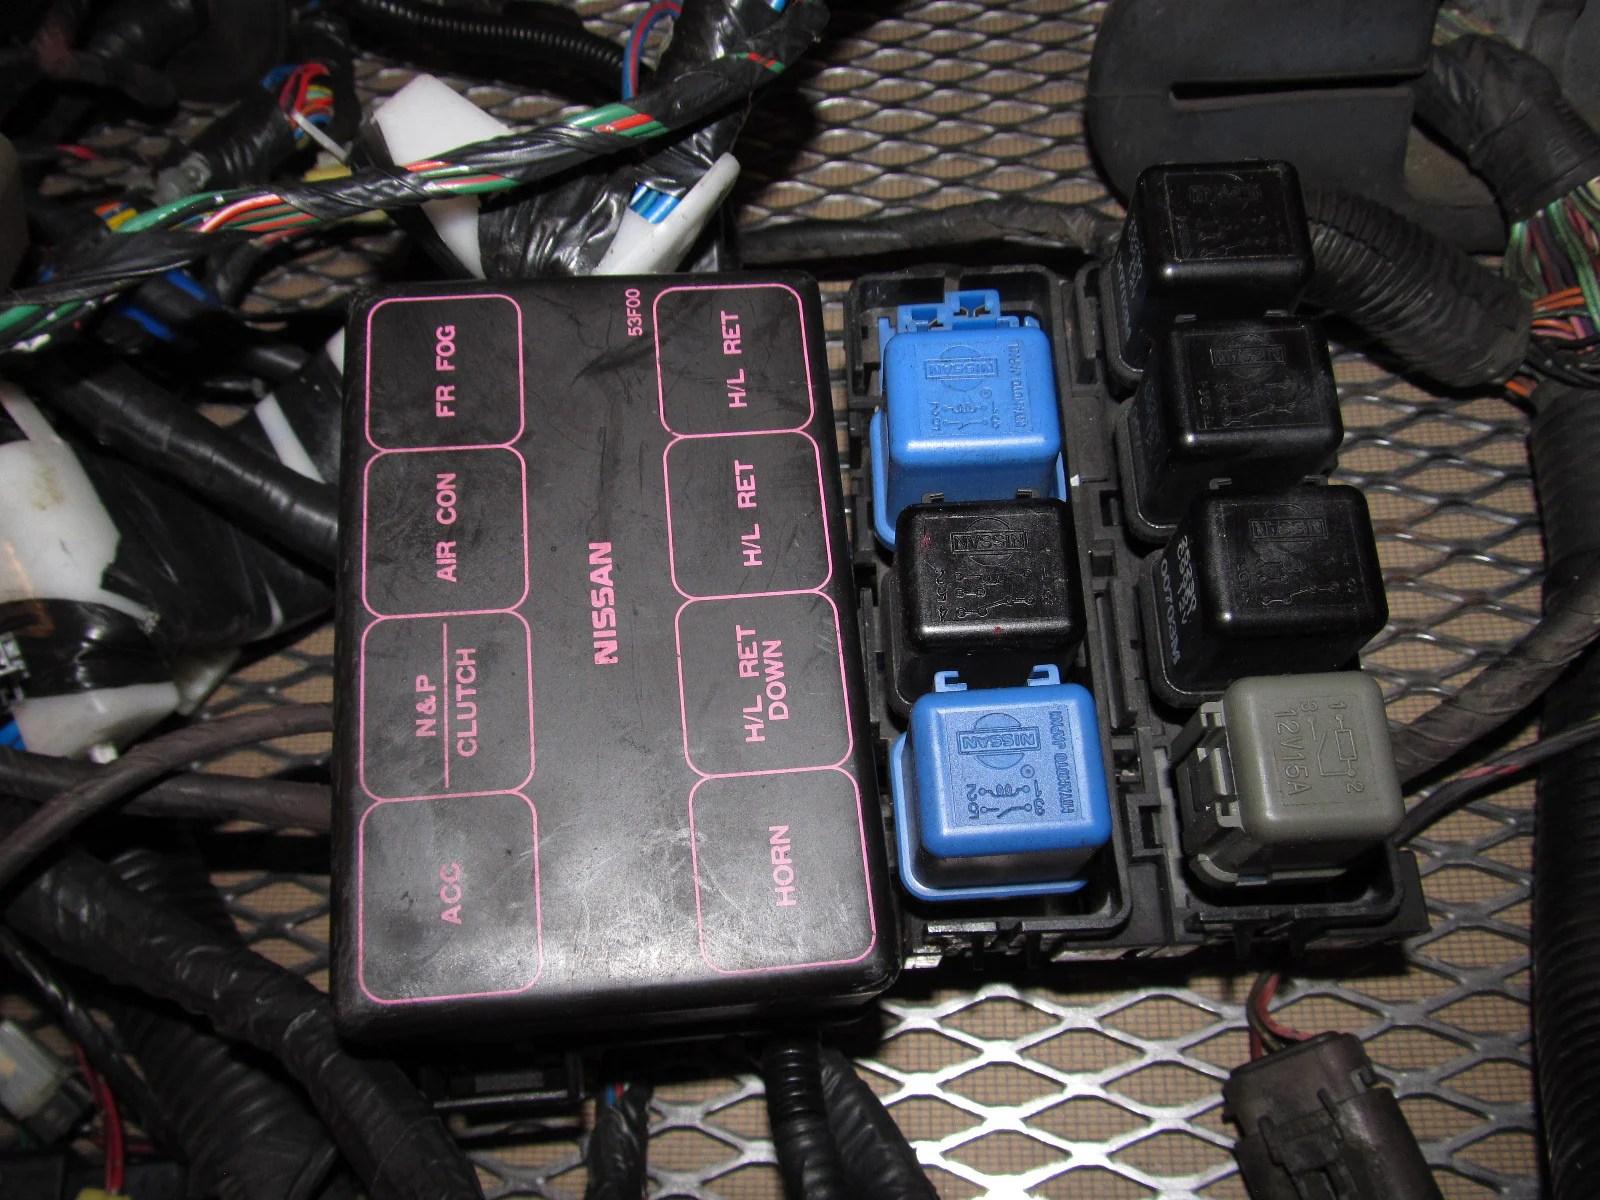 medium resolution of nissan 240sx fuse box wiring diagram third level mazda 3 fuse box nissan 240sx fuse box